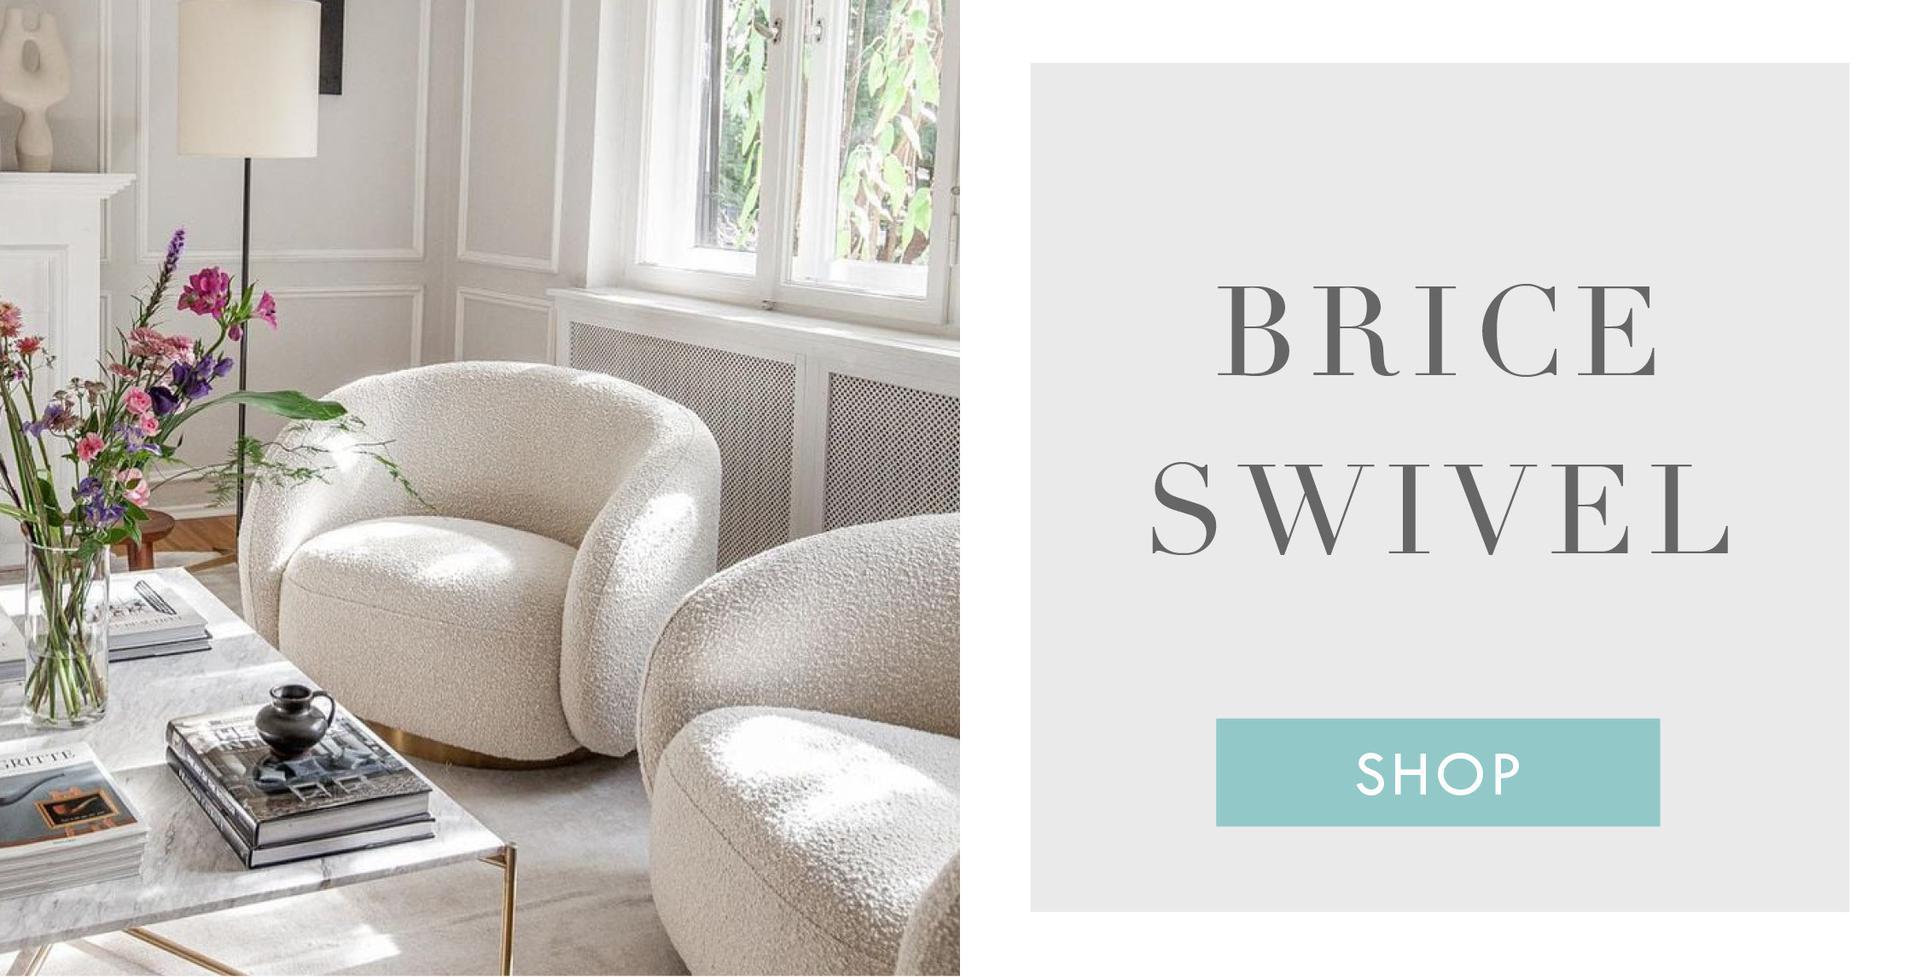 Shop The Brice Swivel